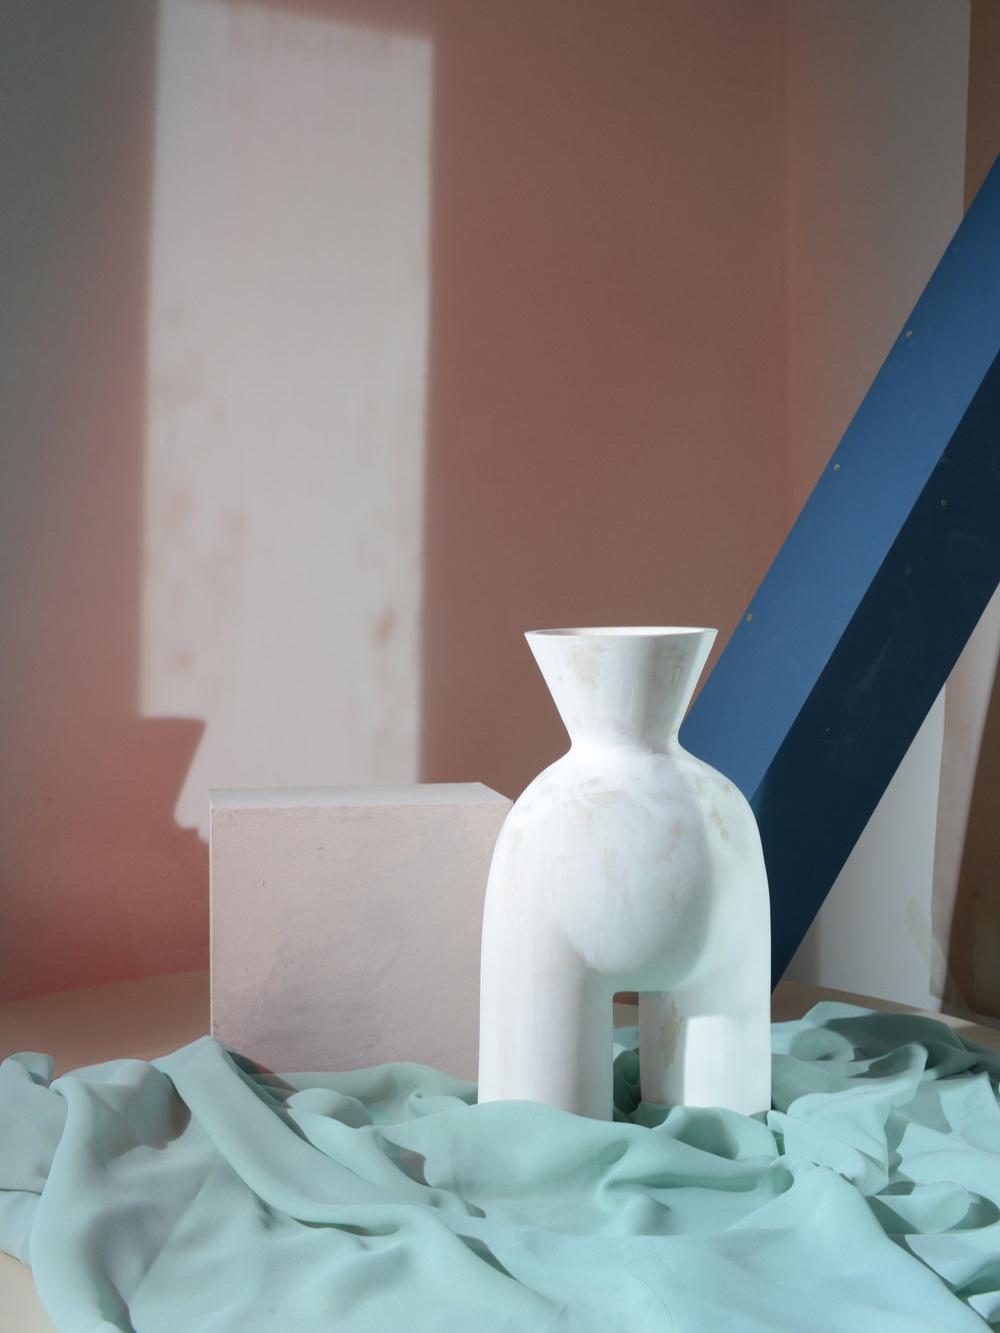 Ceramic vase by Valentina Cameranesi